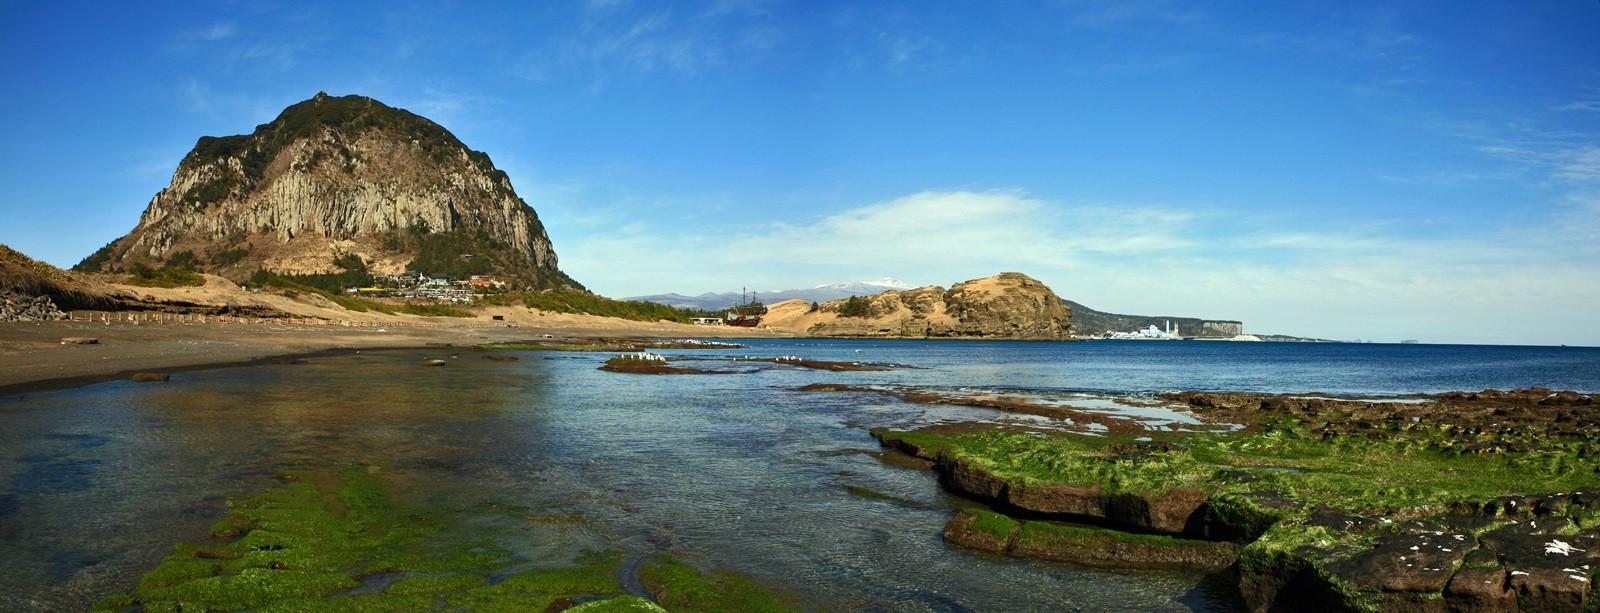 Sanbangsan and Yongmeori Coast